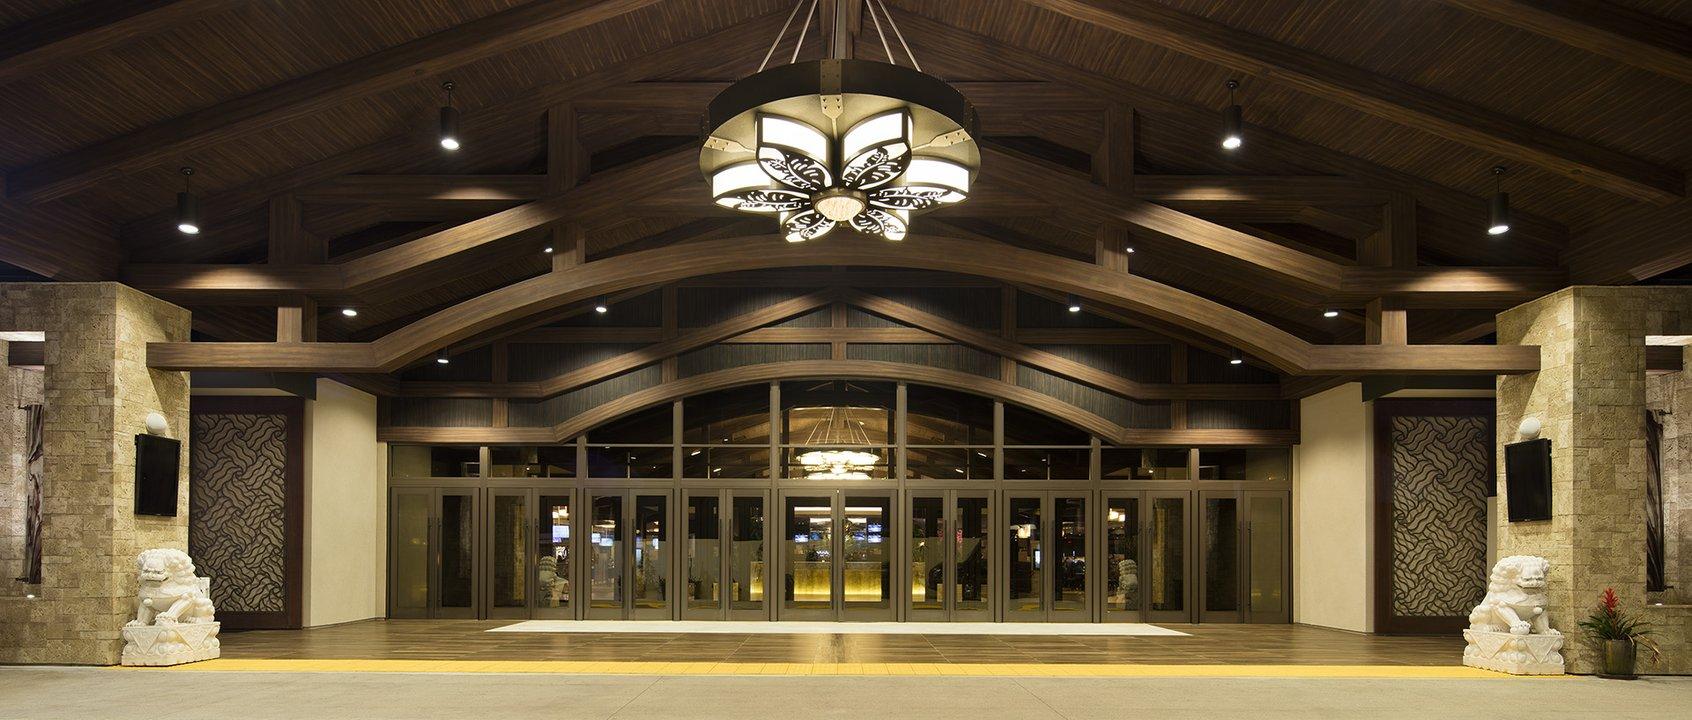 Hawaiian Gardens Casino | JCJ Architecture